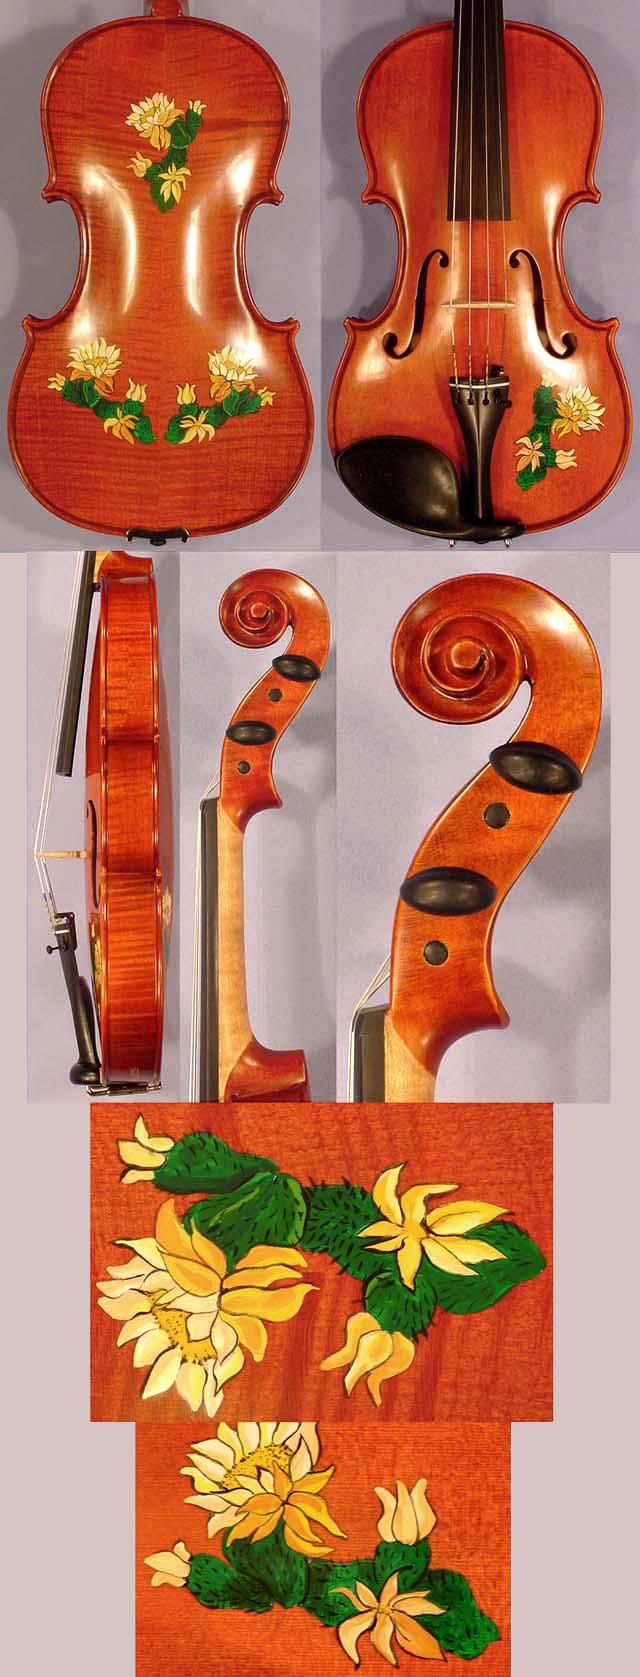 Artistic 4/4 WORKSHOP 'GEMS 1' Flowers Violin